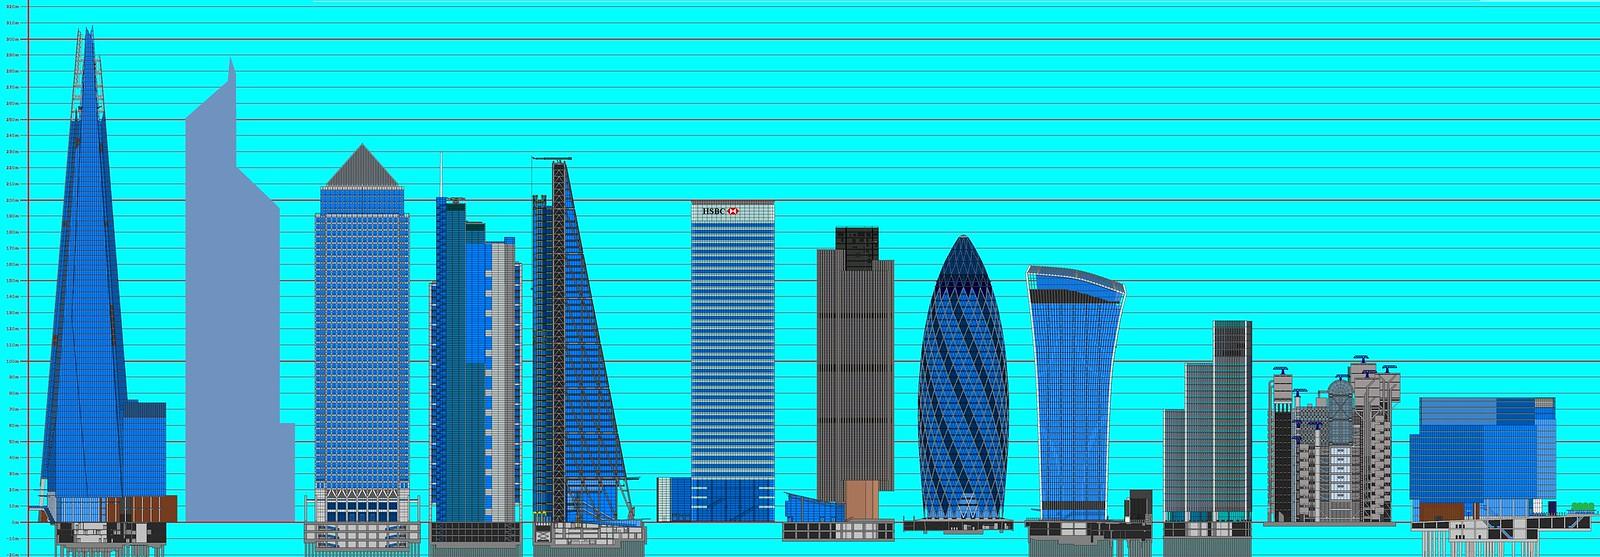 Twentytwo Building Design